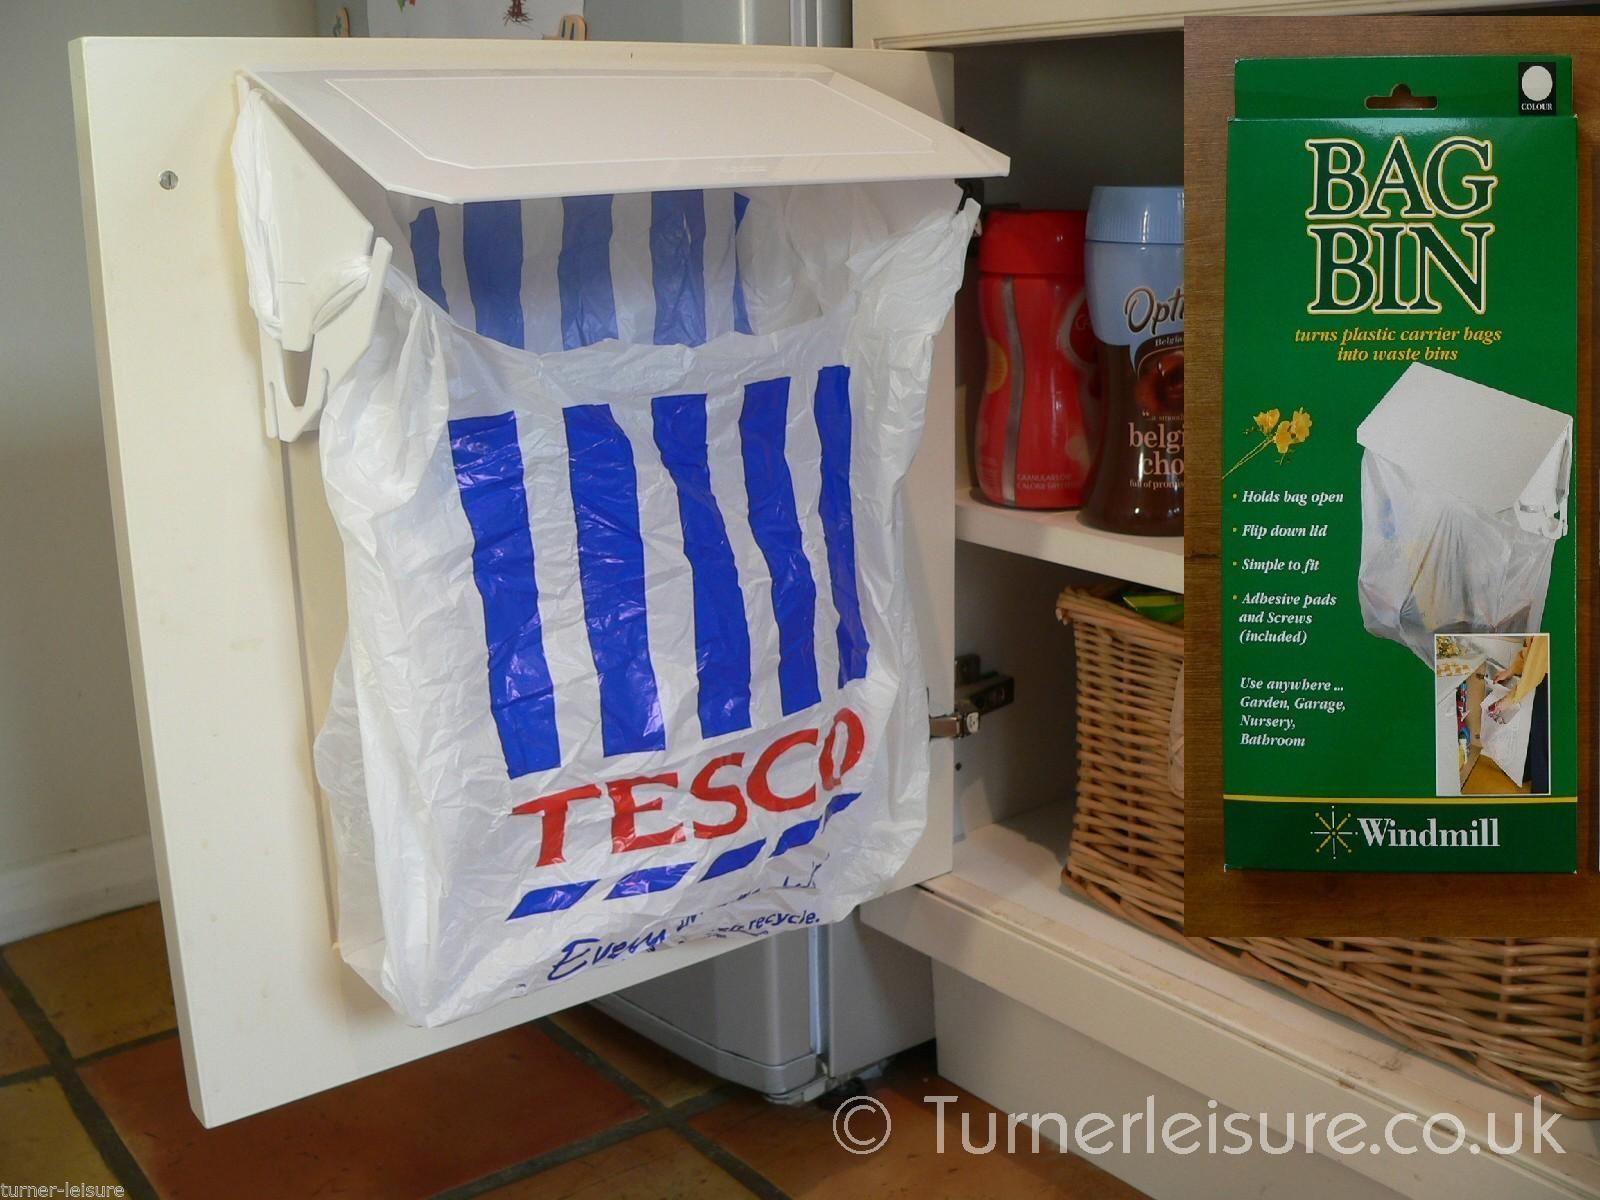 Carrier bag bin holder Plastic bags to rubbish bag in motorhome \u0026 caravan door & Carrier bag bin holder Plastic bags to rubbish bag in motorhome ...